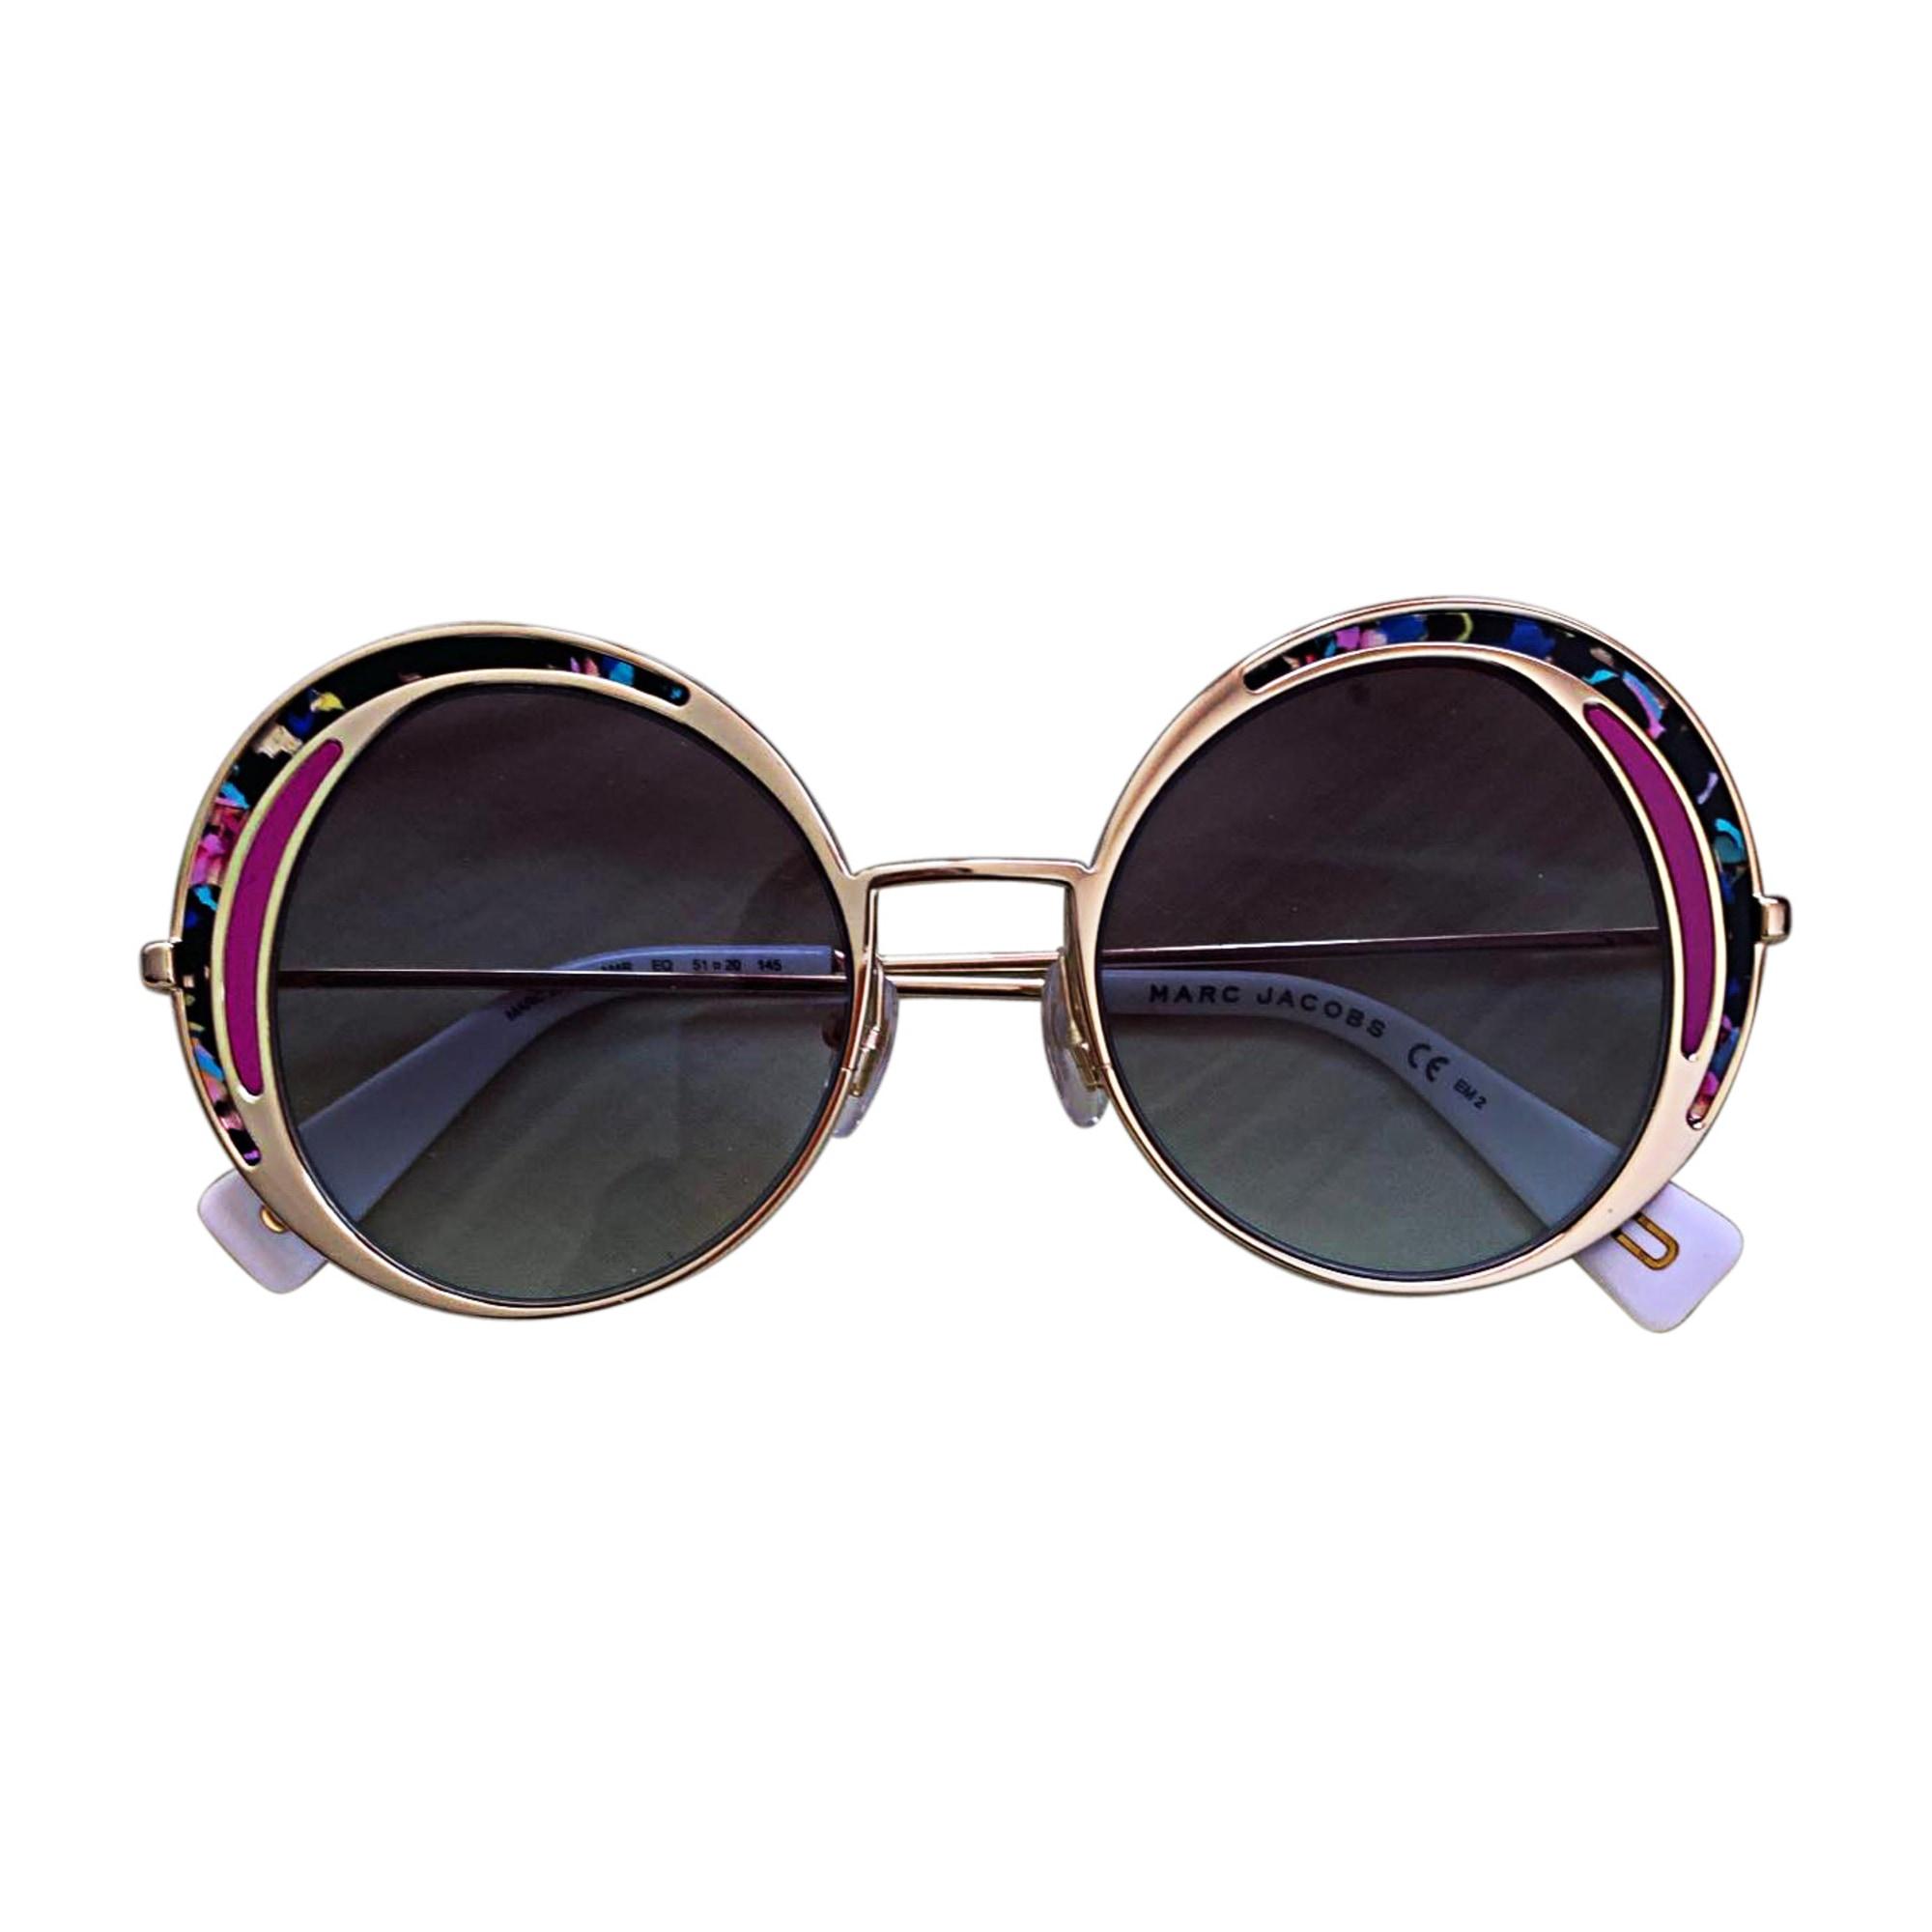 Sunglasses MARC JACOBS Multicolor